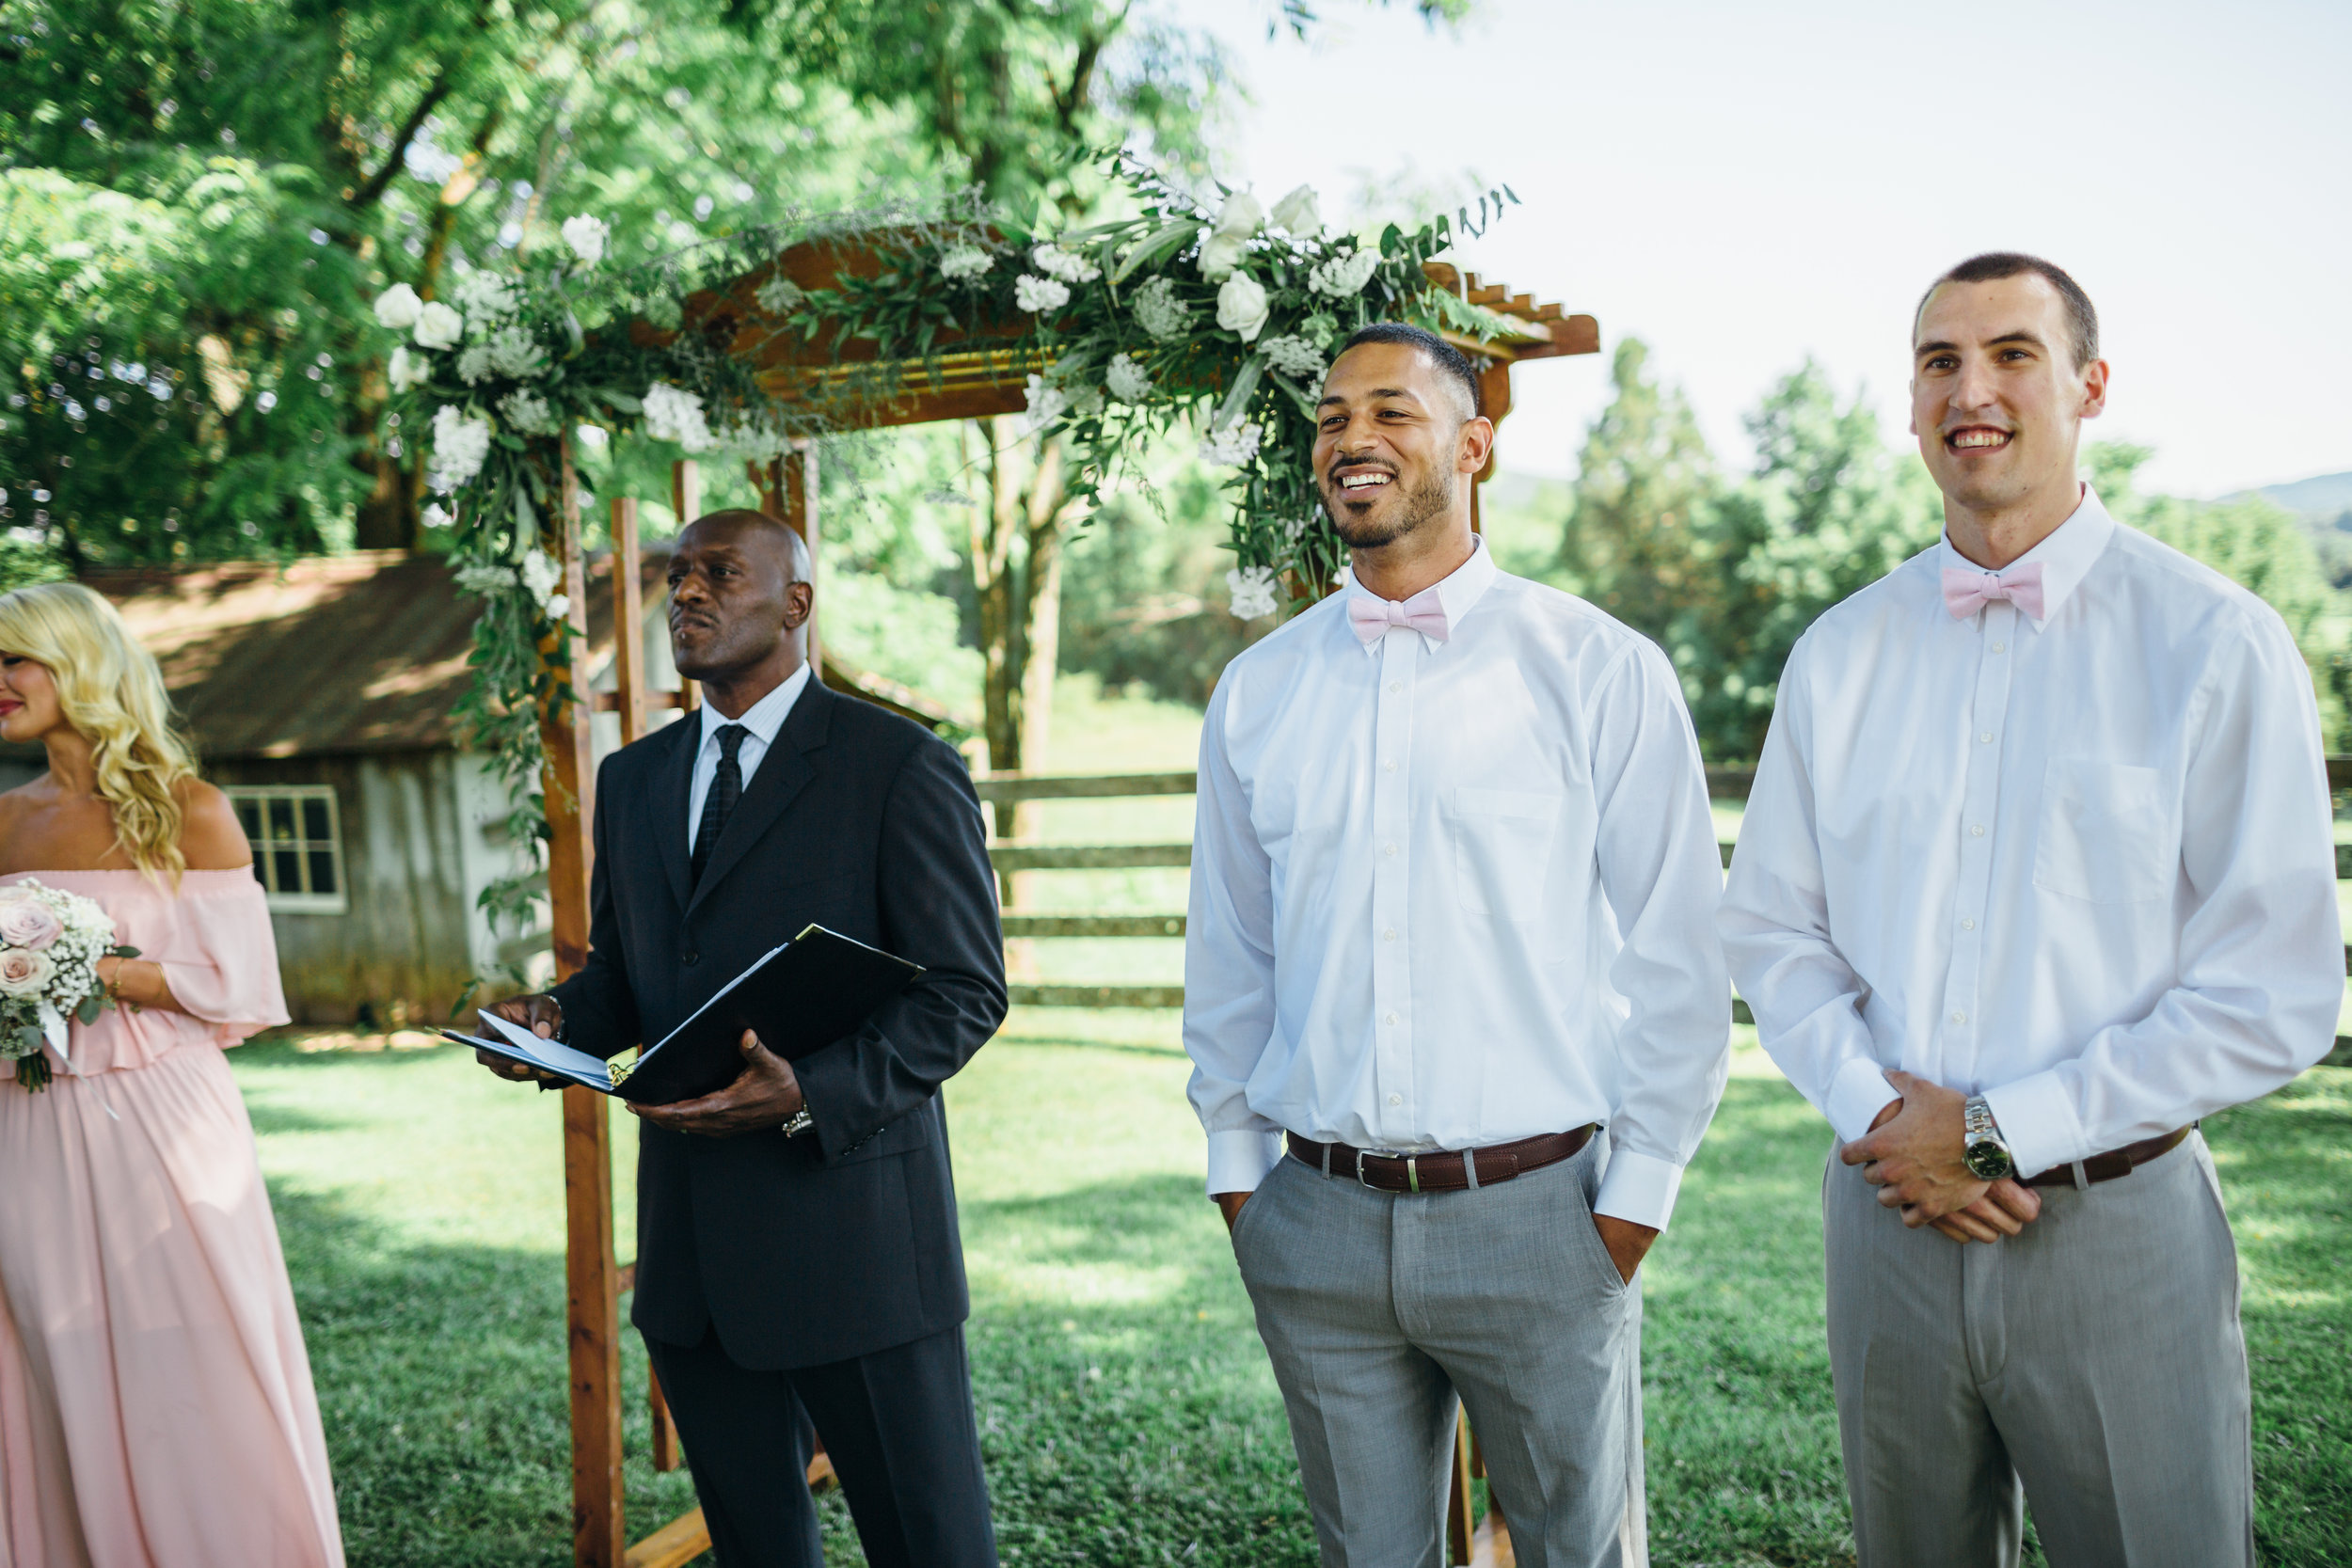 Lynchburg Wedding Photographer; Lynchburg Photographer; Lynchburg Wedding; Sorella Farms Wedding; Virginia Wedding Photographer; Virginia Wedding-10.jpg